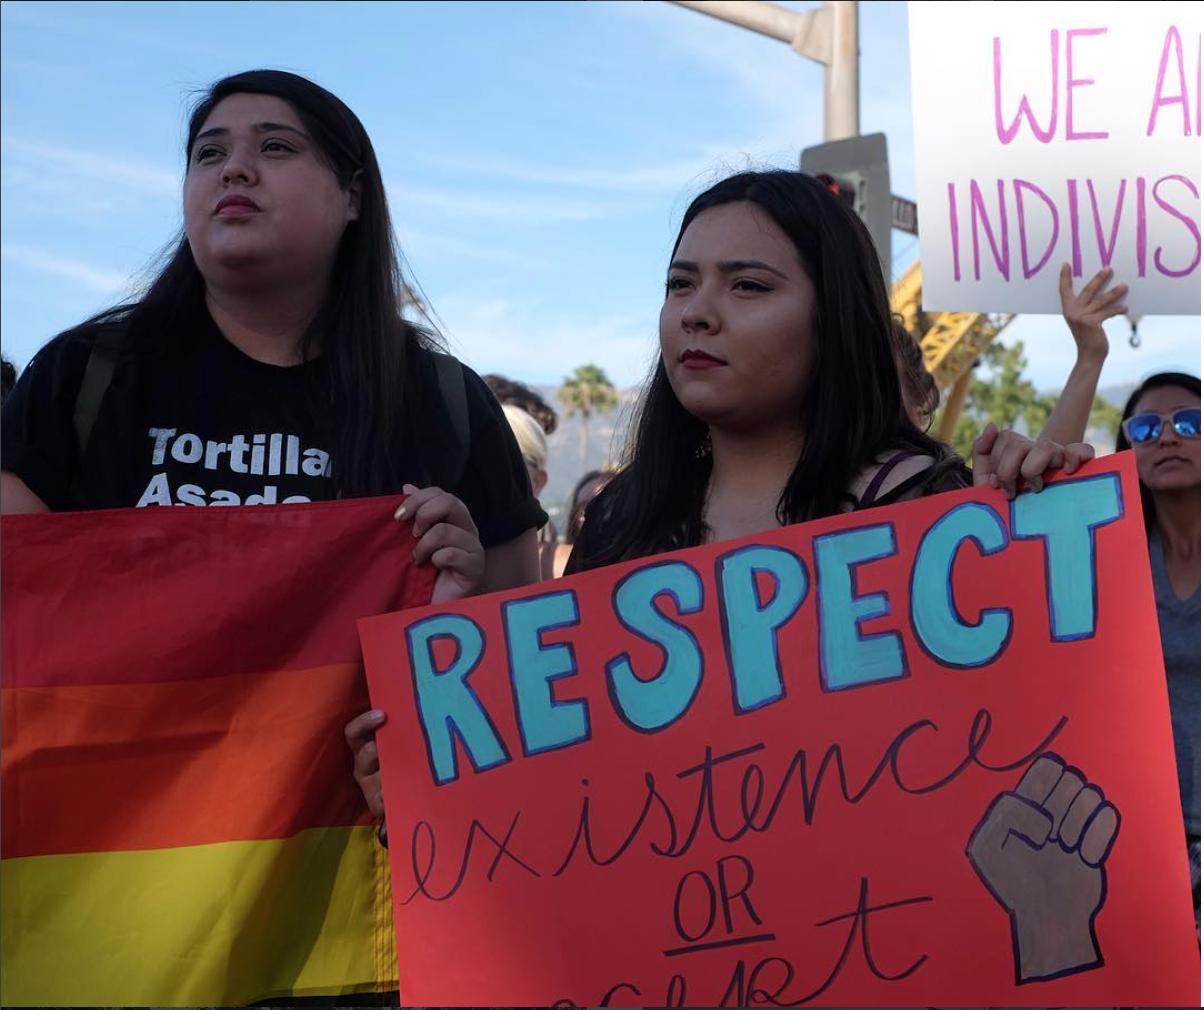 Santa Barbara, CA. Protestors march in solidarity against Trump in downtown SB. #SnapshotLives  #California  #fujixt1